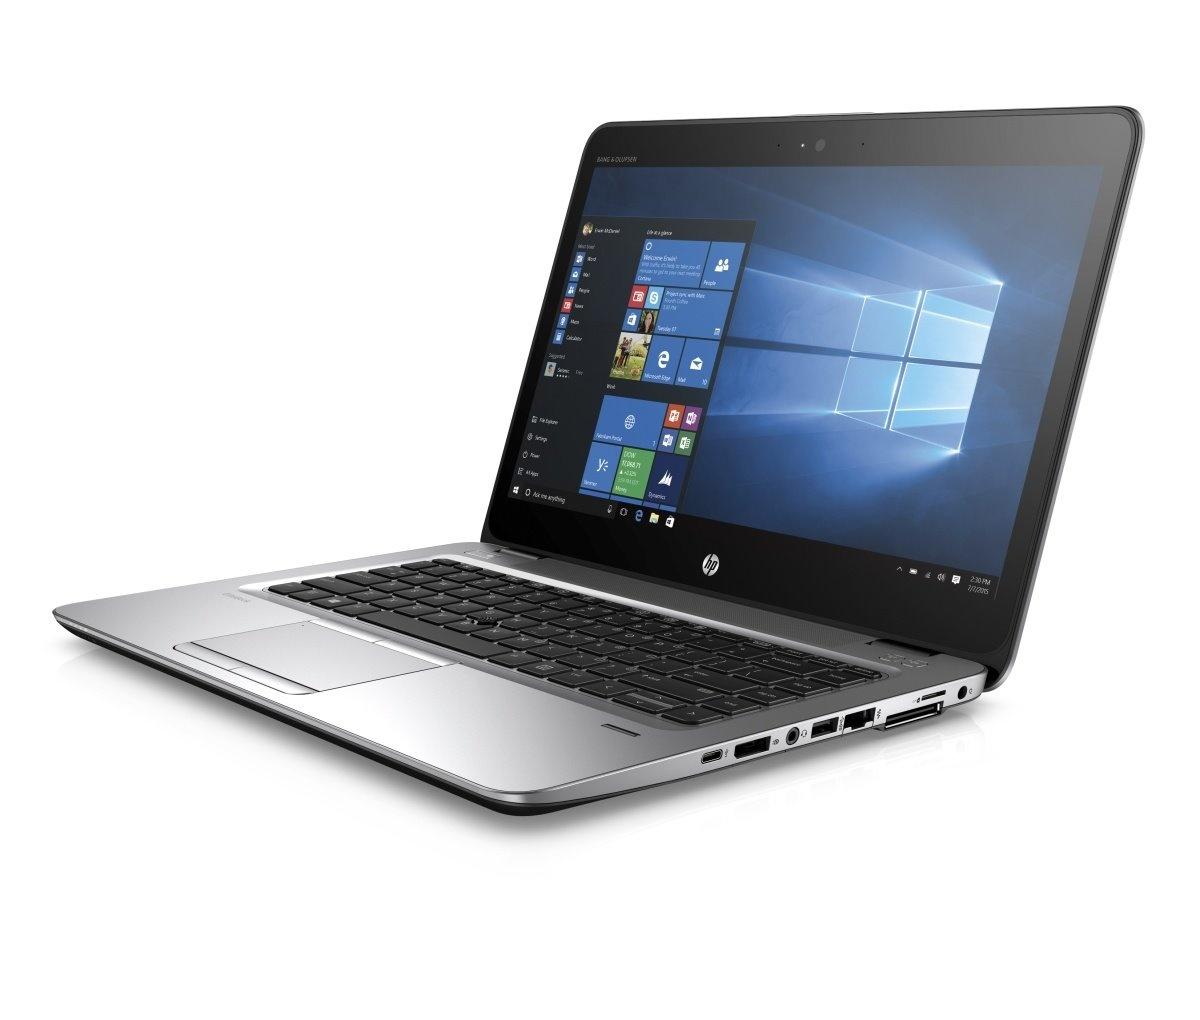 HP EliteBook 840 G3 top